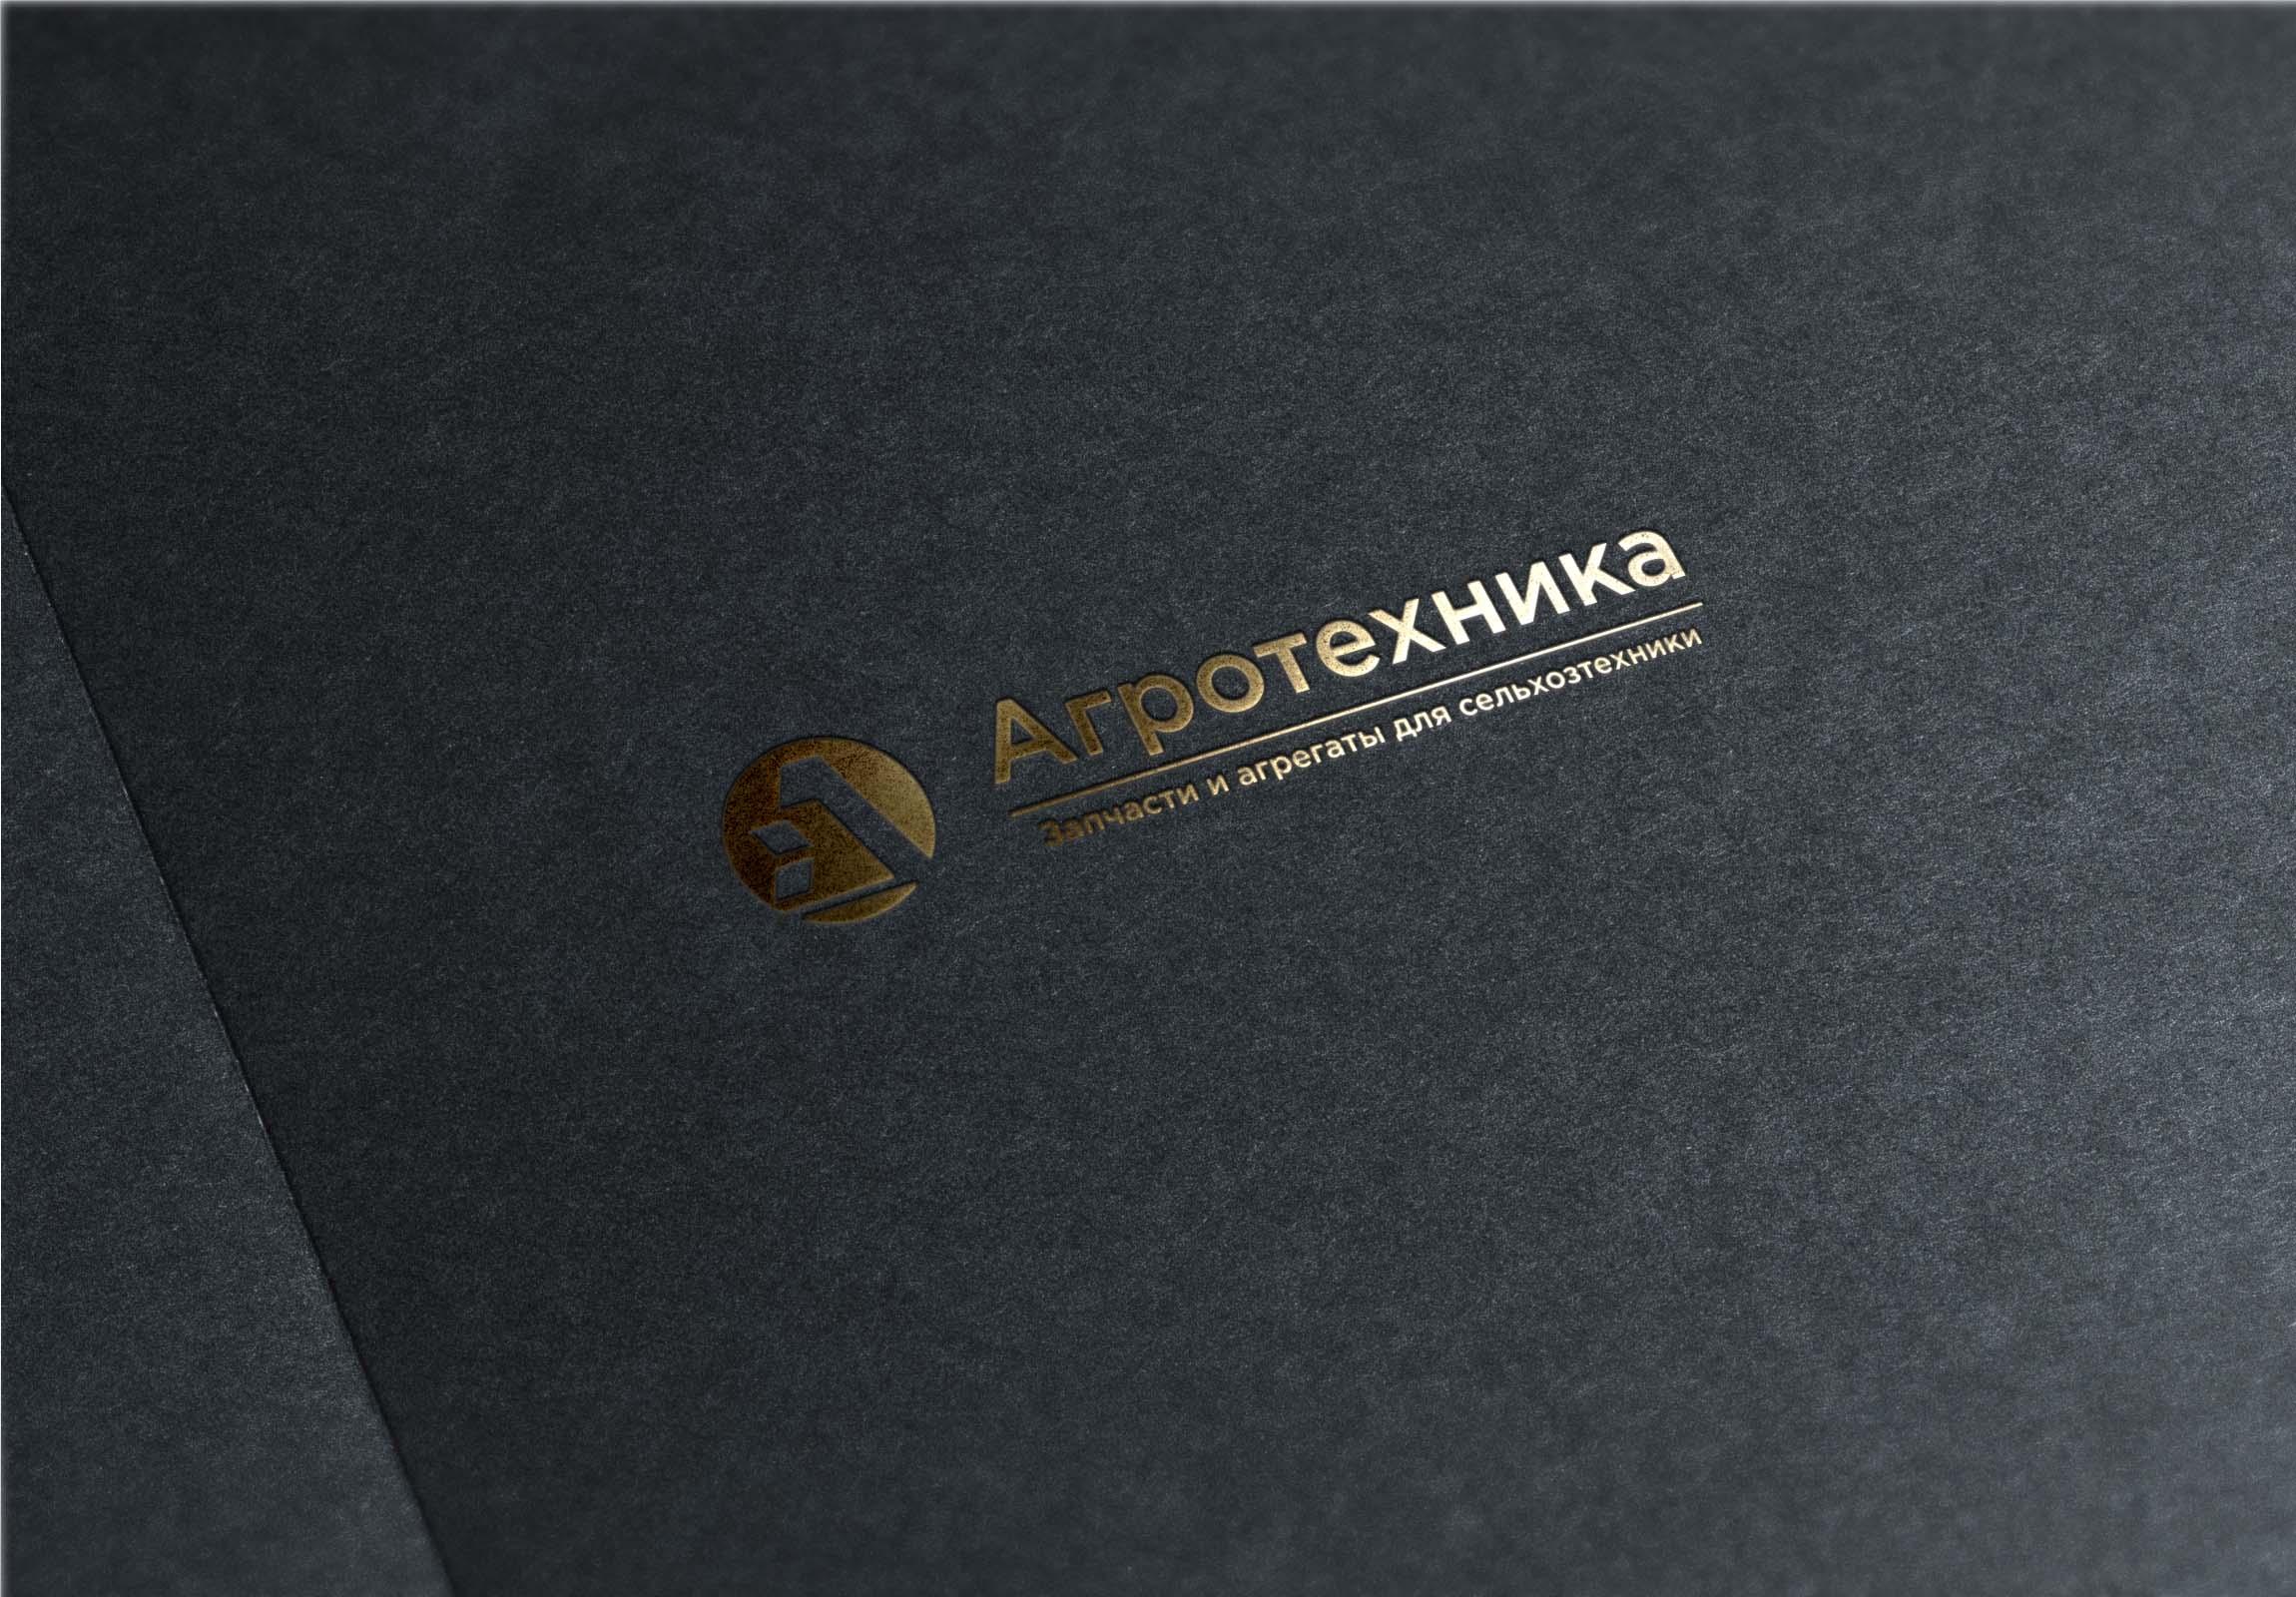 Разработка логотипа для компании Агротехника фото f_6125c04067129627.jpg